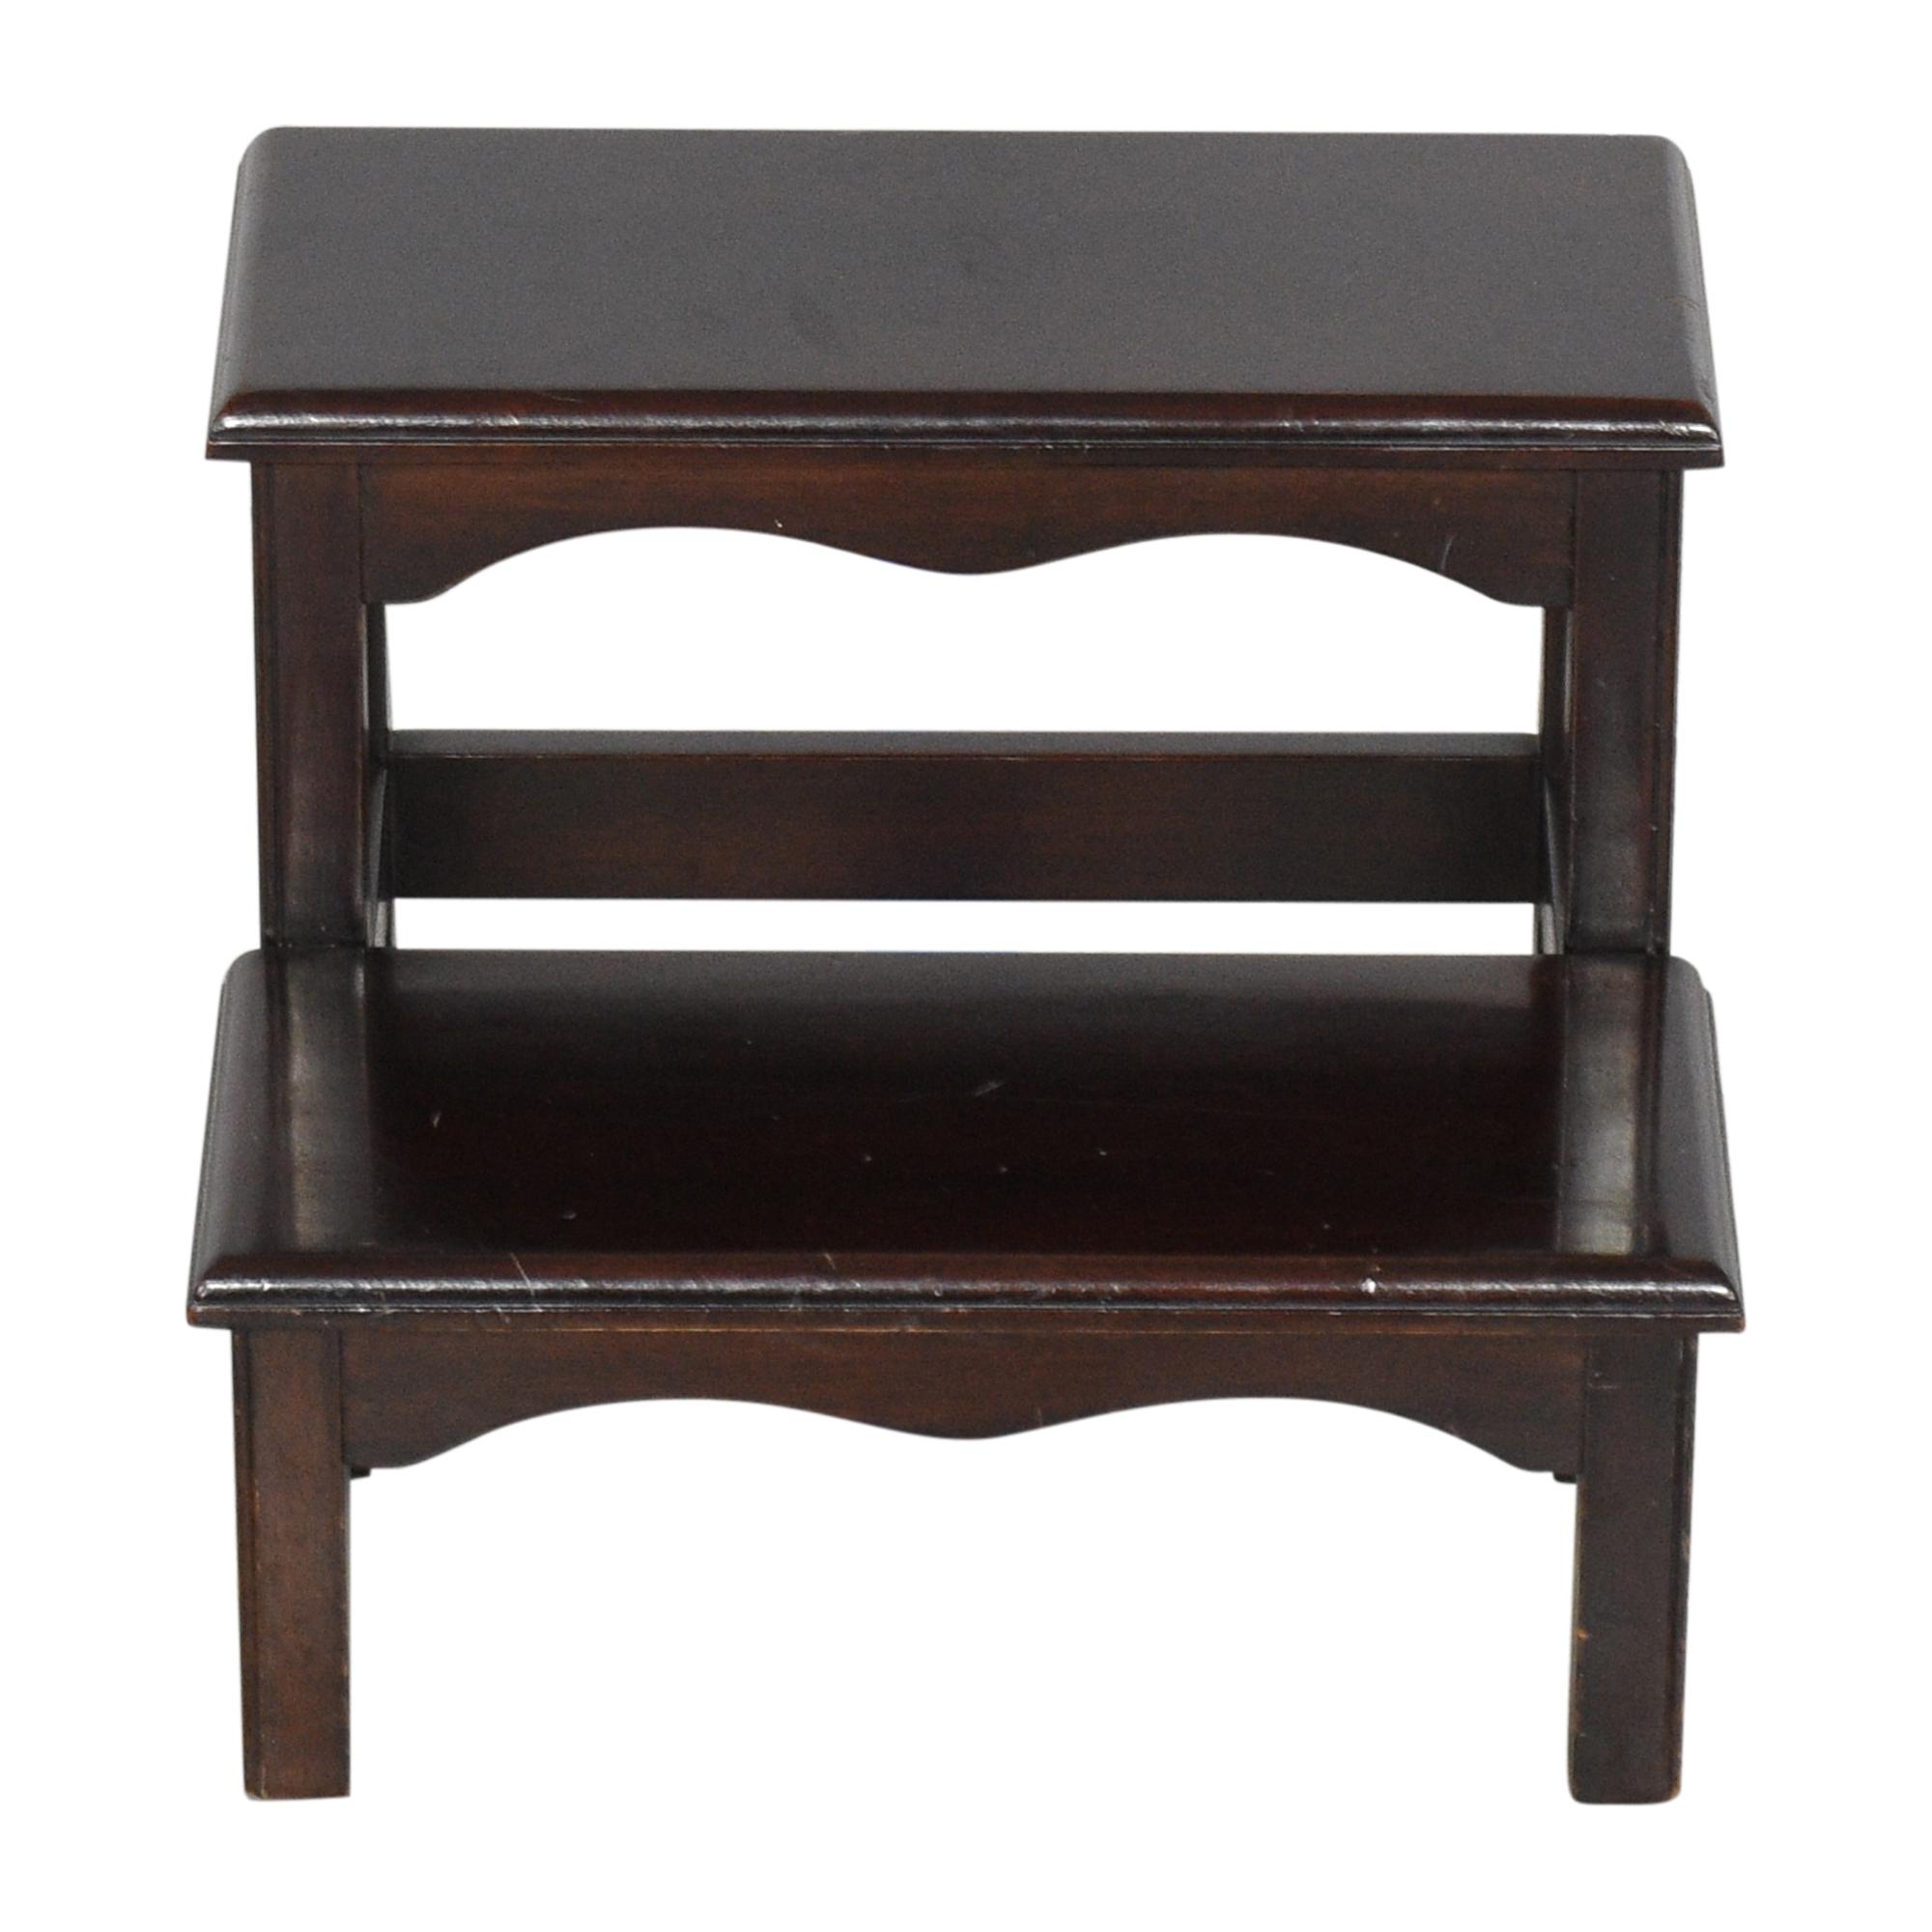 shop Stickley Furniture Stickley Furniture Step Stool online